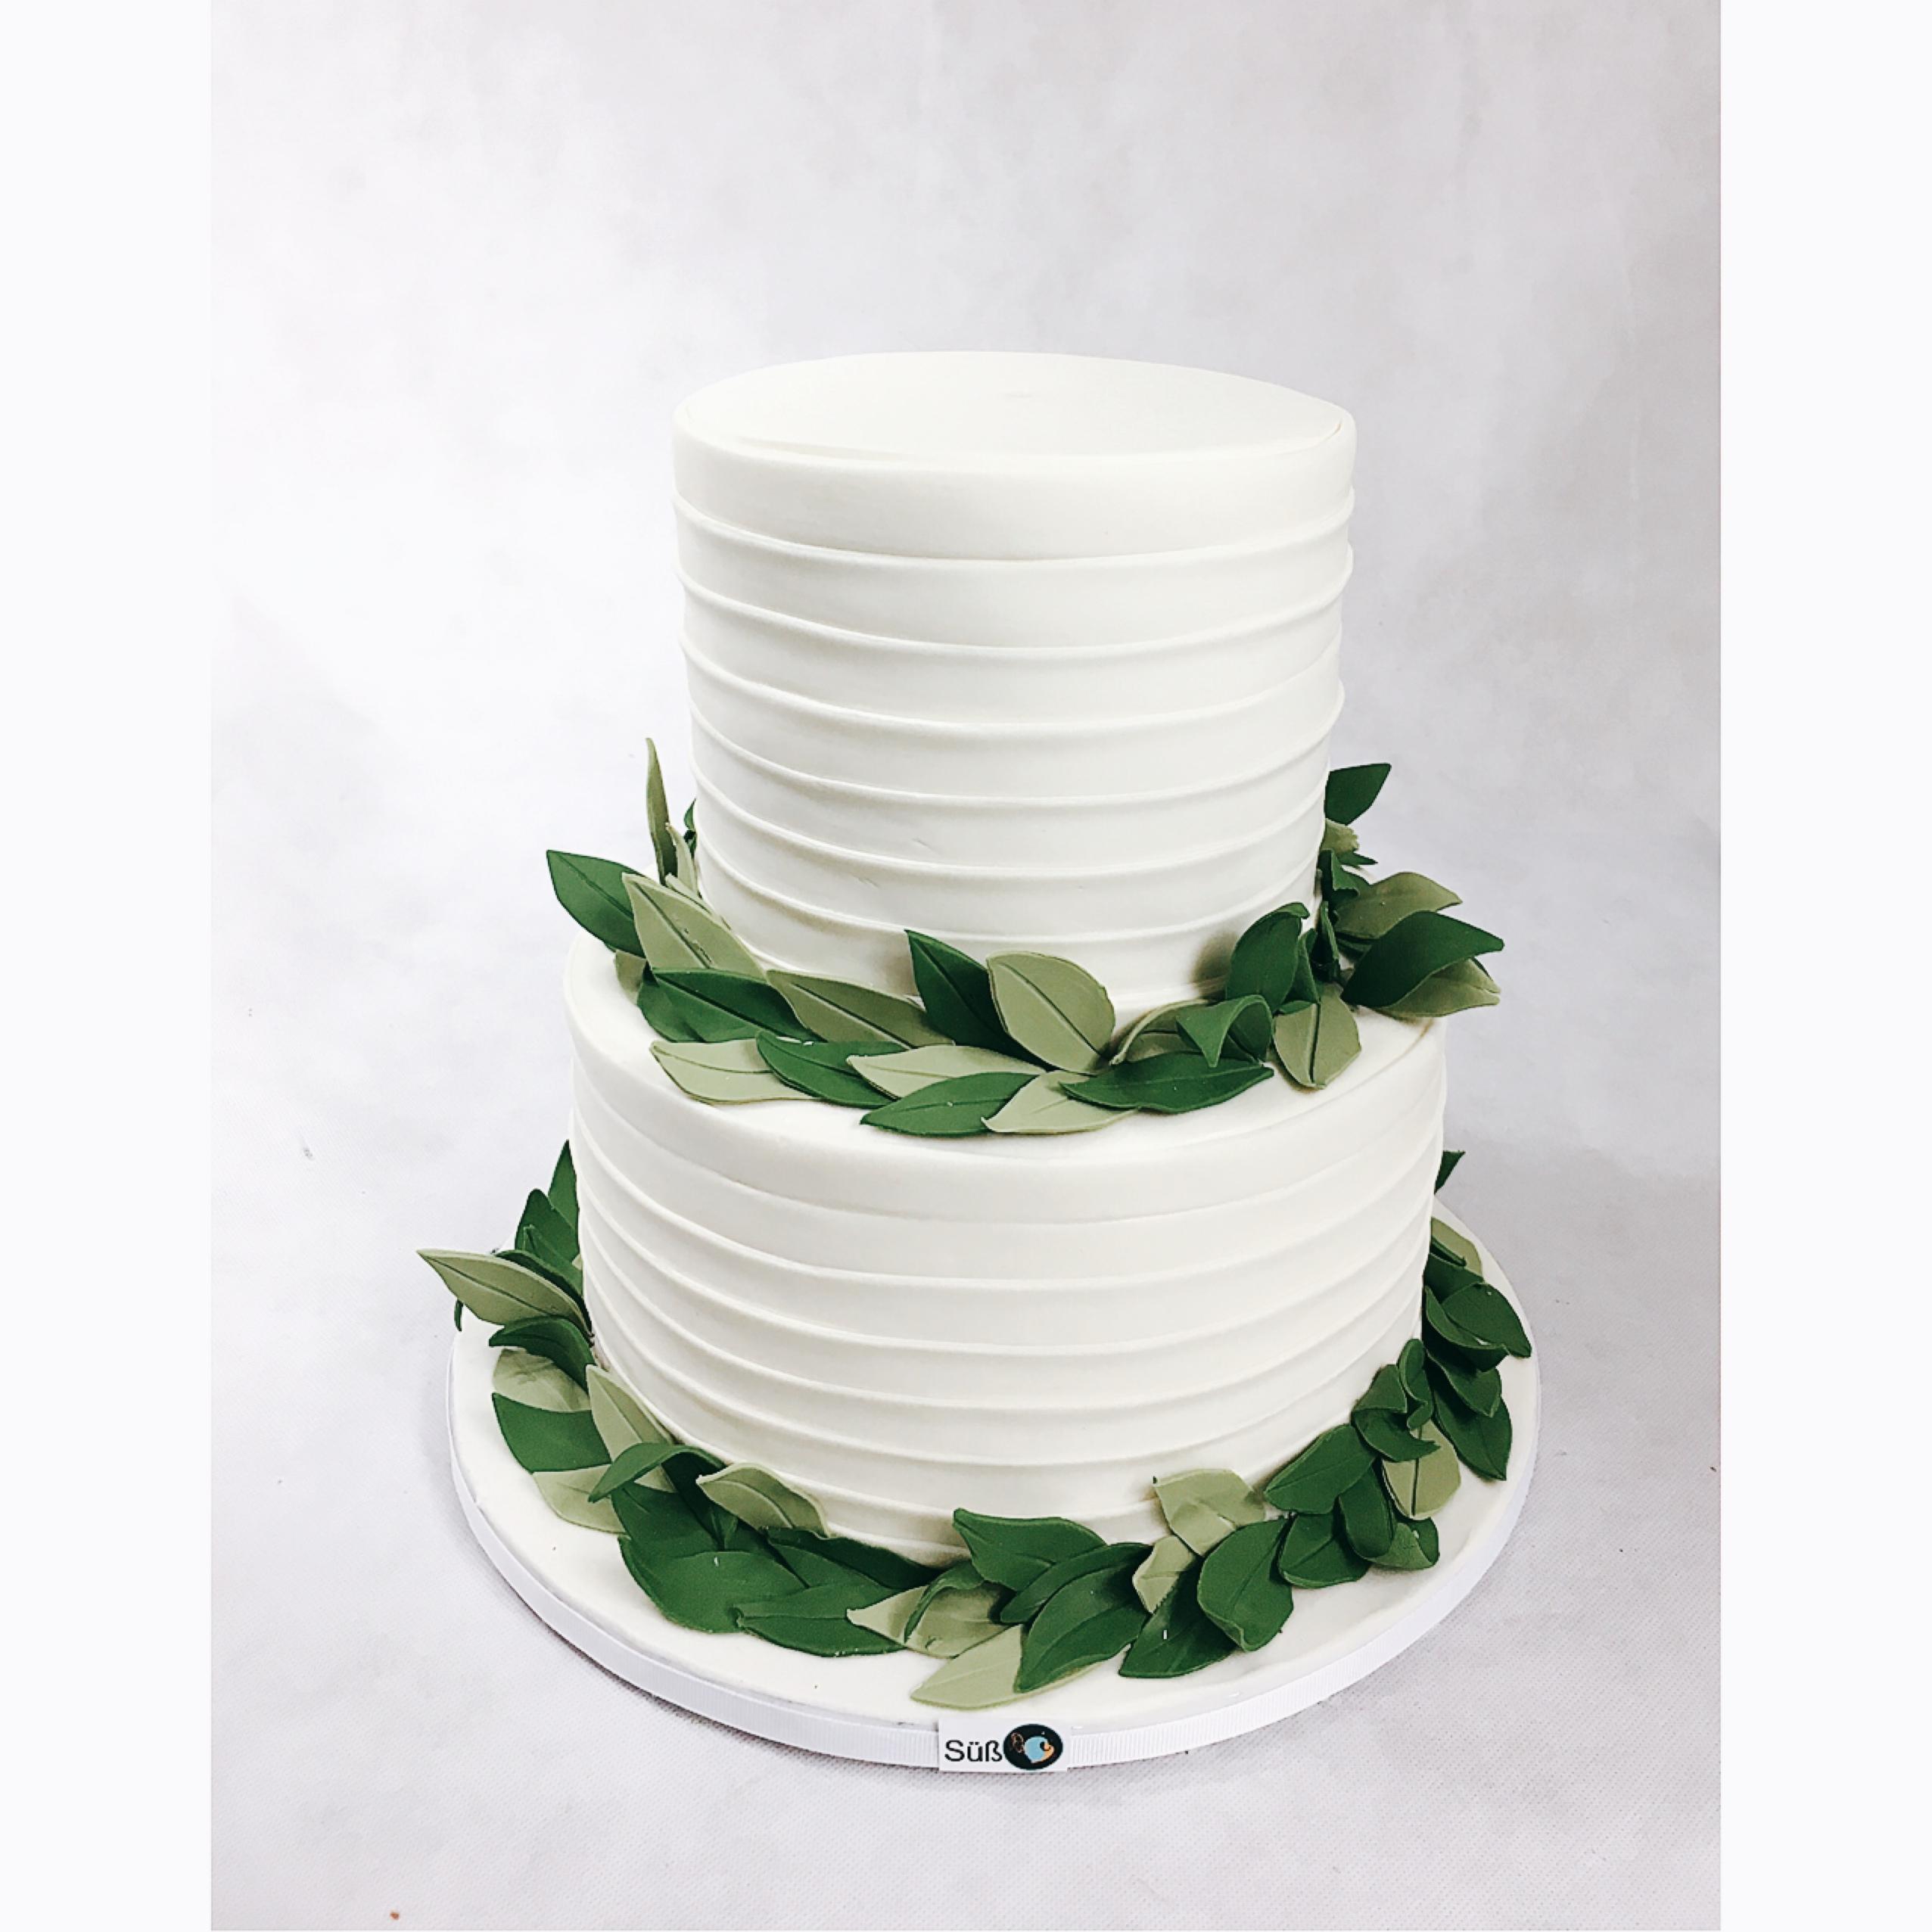 White fondant wedding cake with gum paste fern greenery